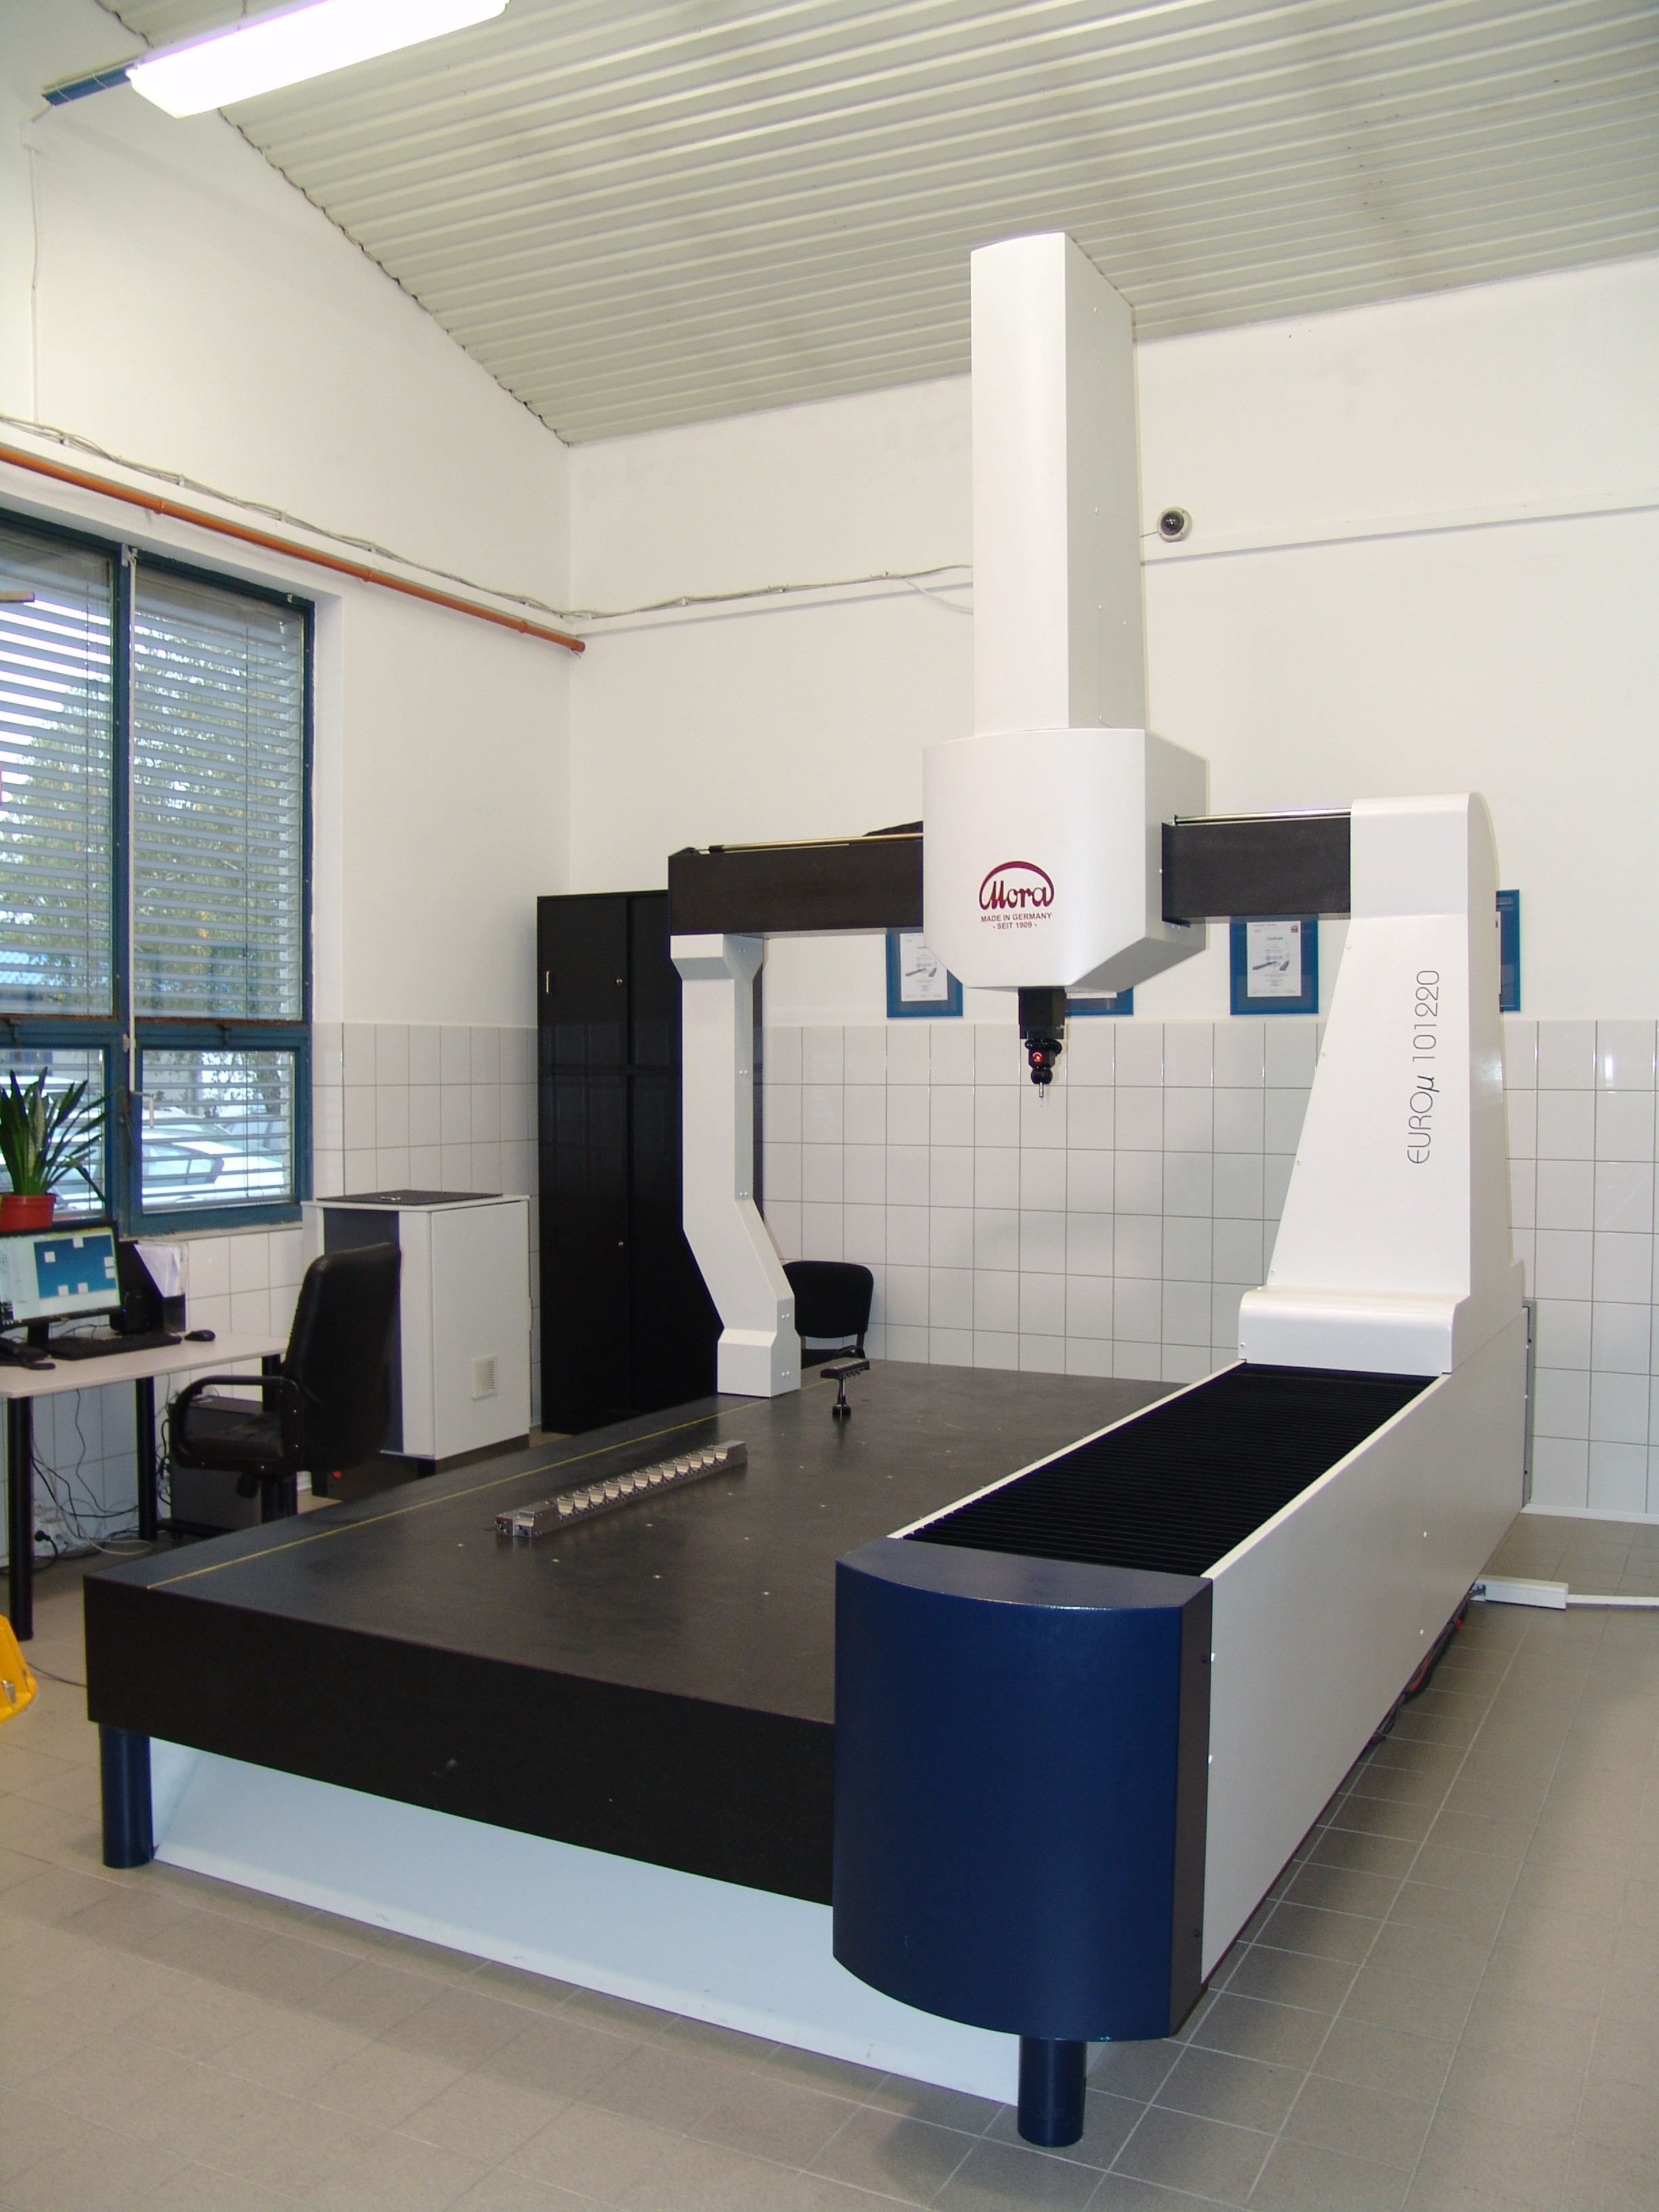 banc de mesure mora metrology deutschland euro 3. Black Bedroom Furniture Sets. Home Design Ideas